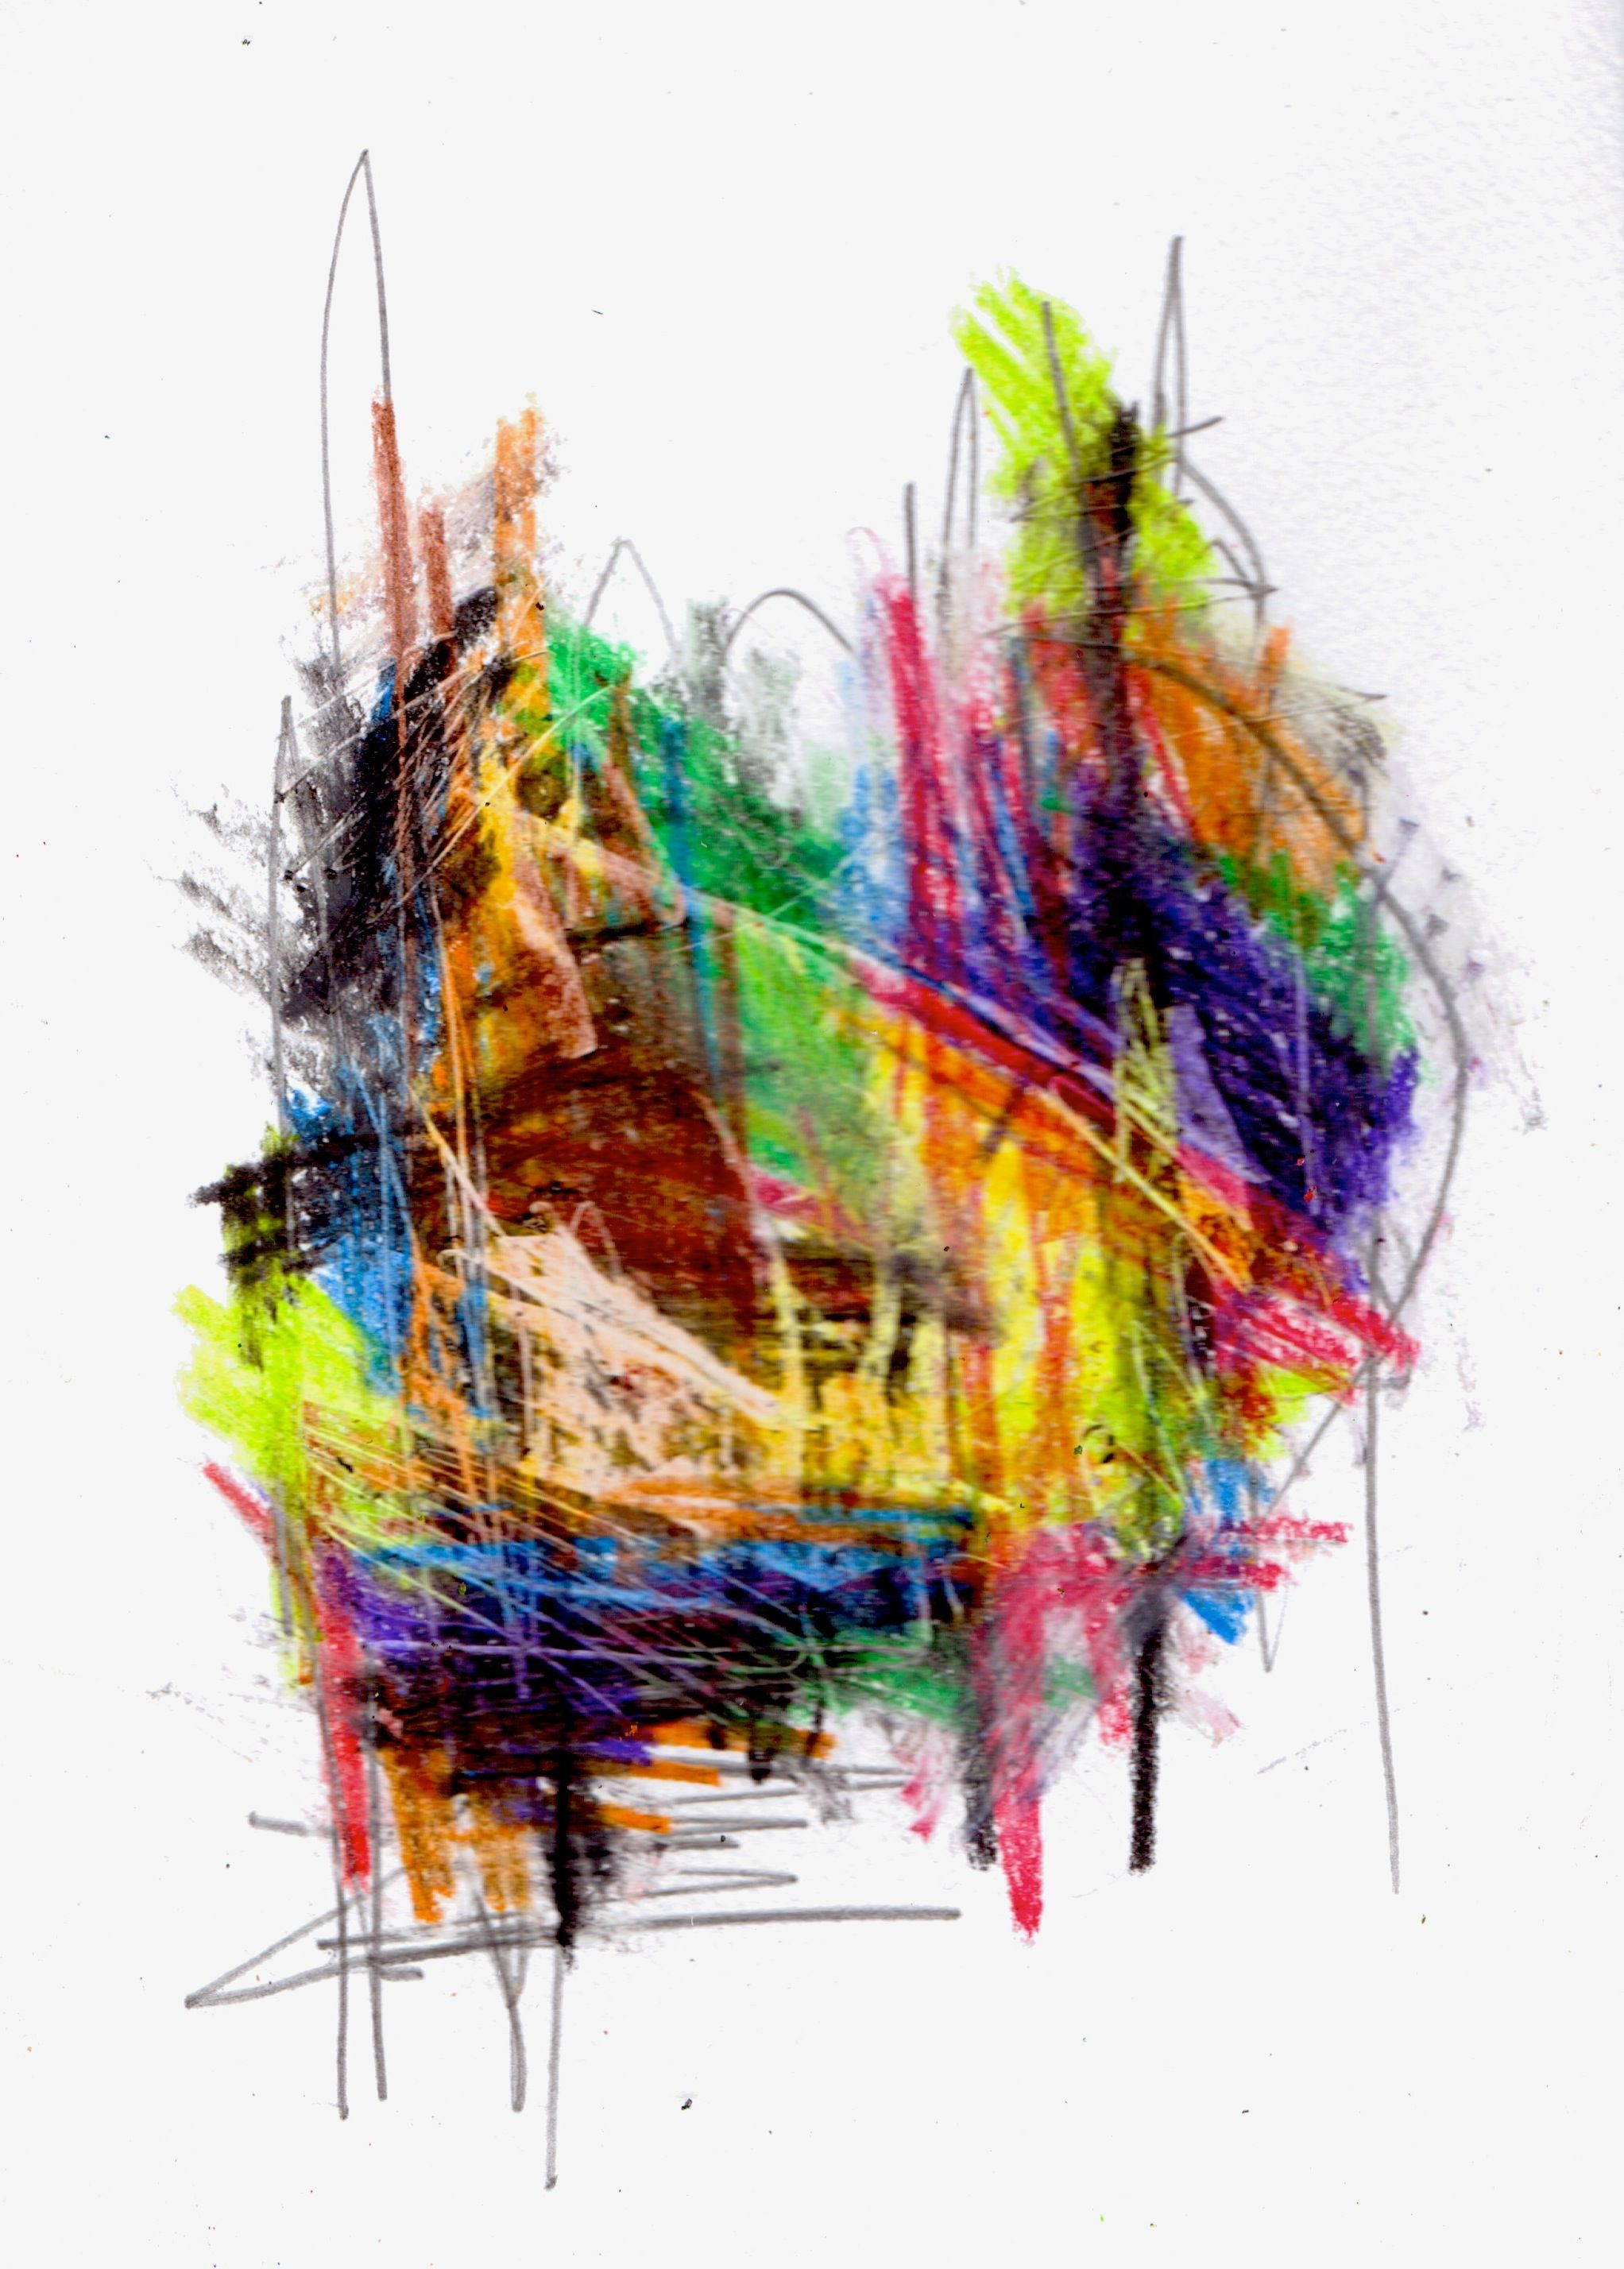 Crayola Crayons - Shop Crayon Packs & Boxes | Crayola